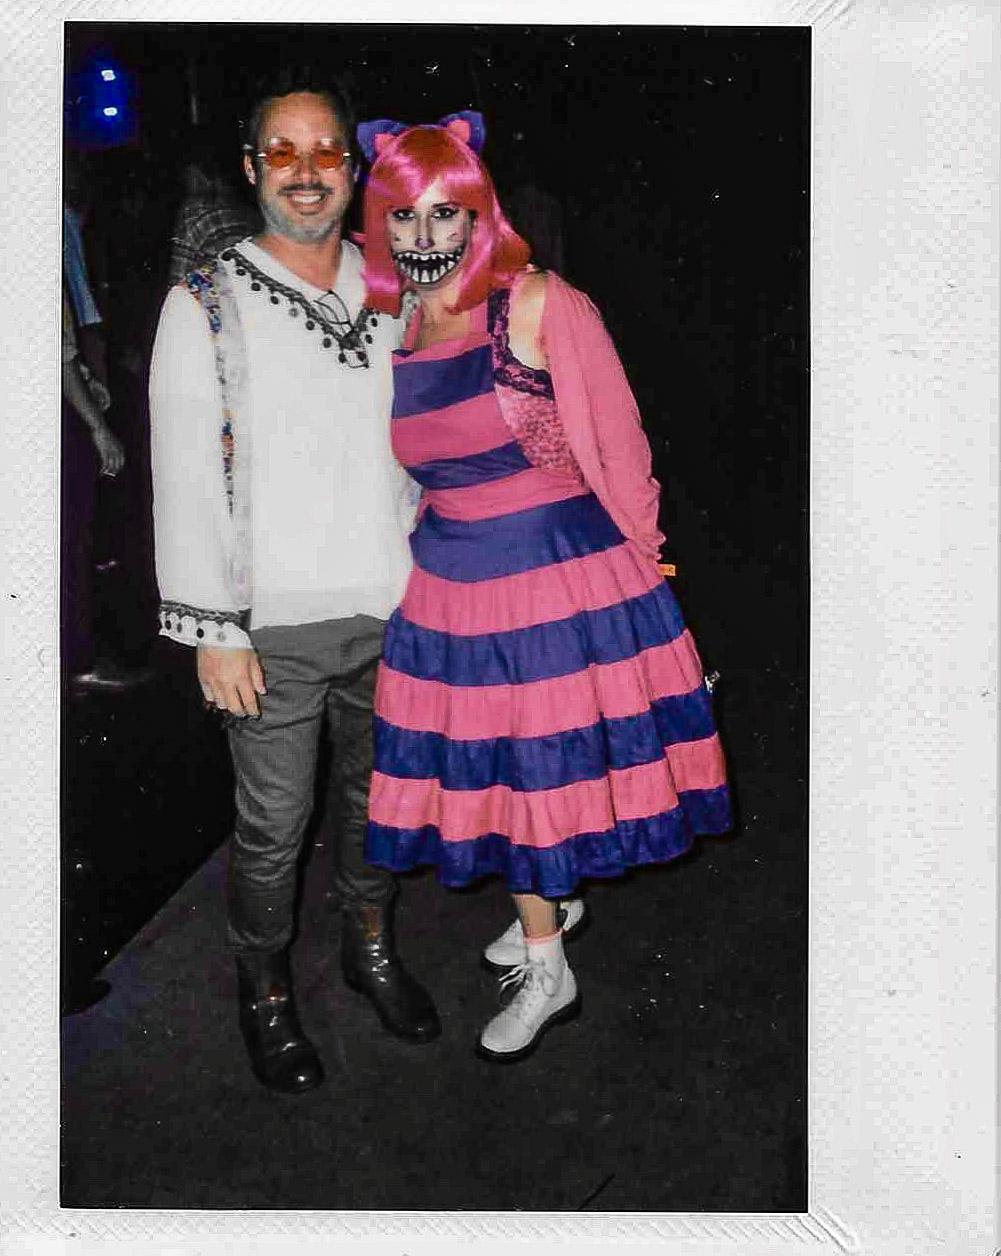 Halloween Party Polaroids 2017 Los Angeles California #halloweenpolaroid